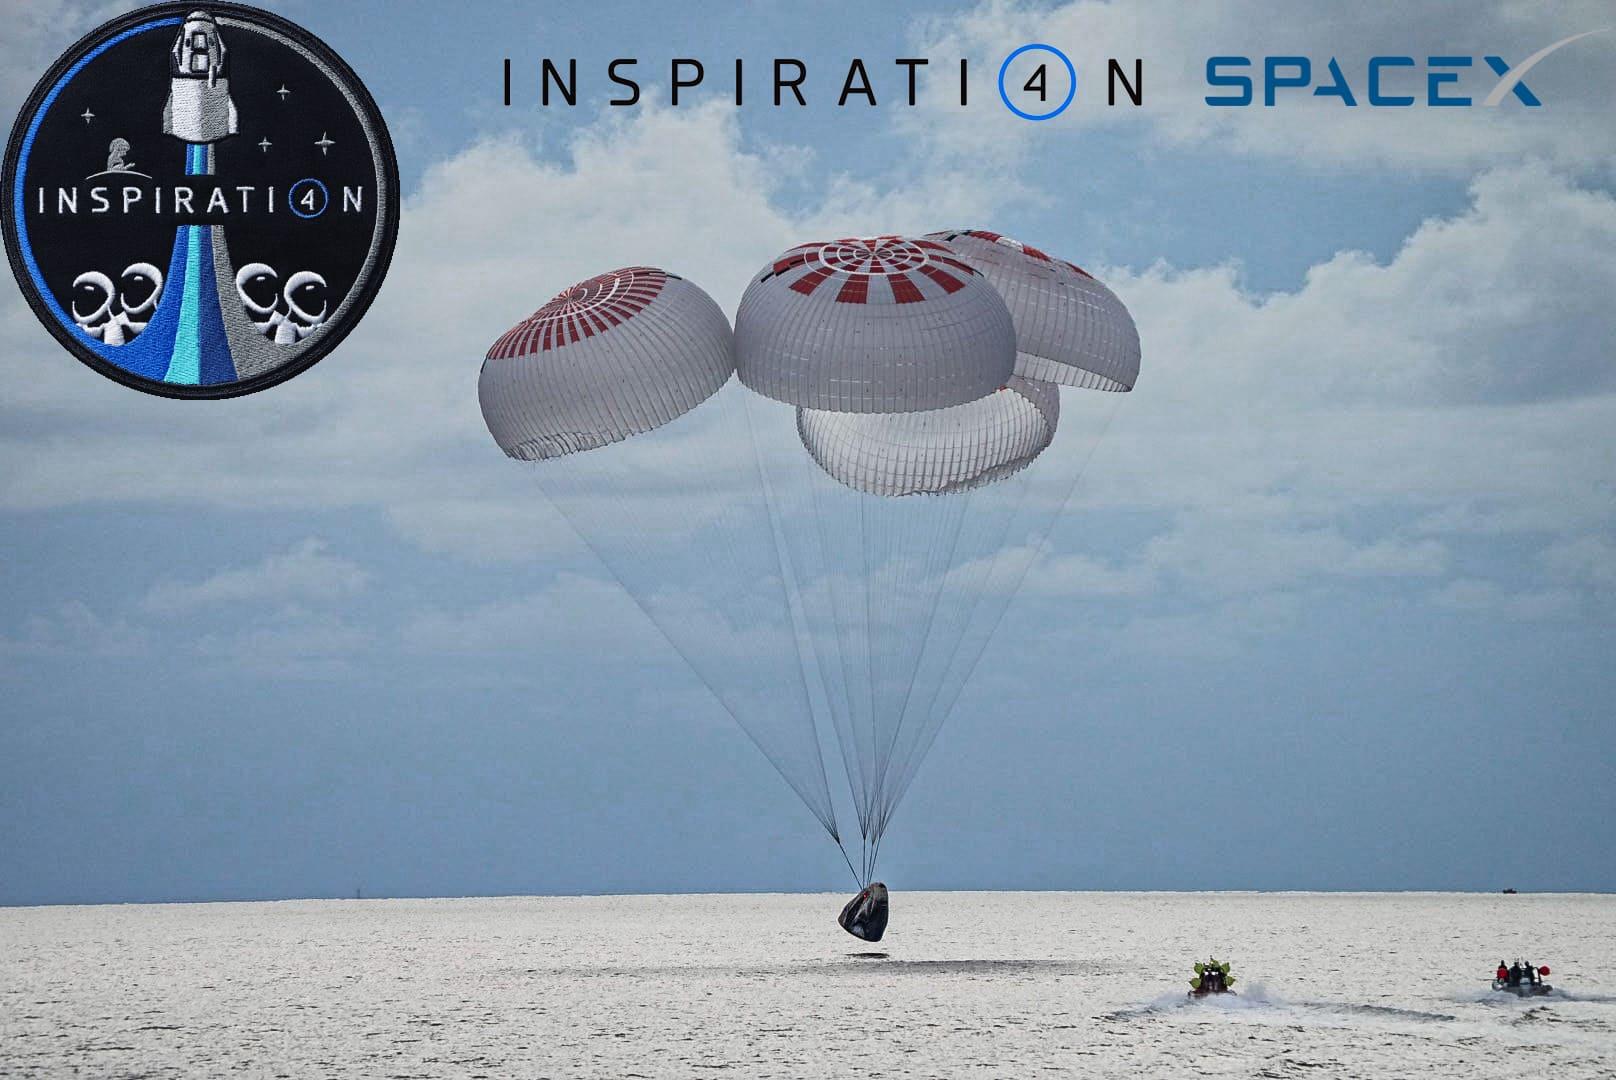 Inspiration4 logo